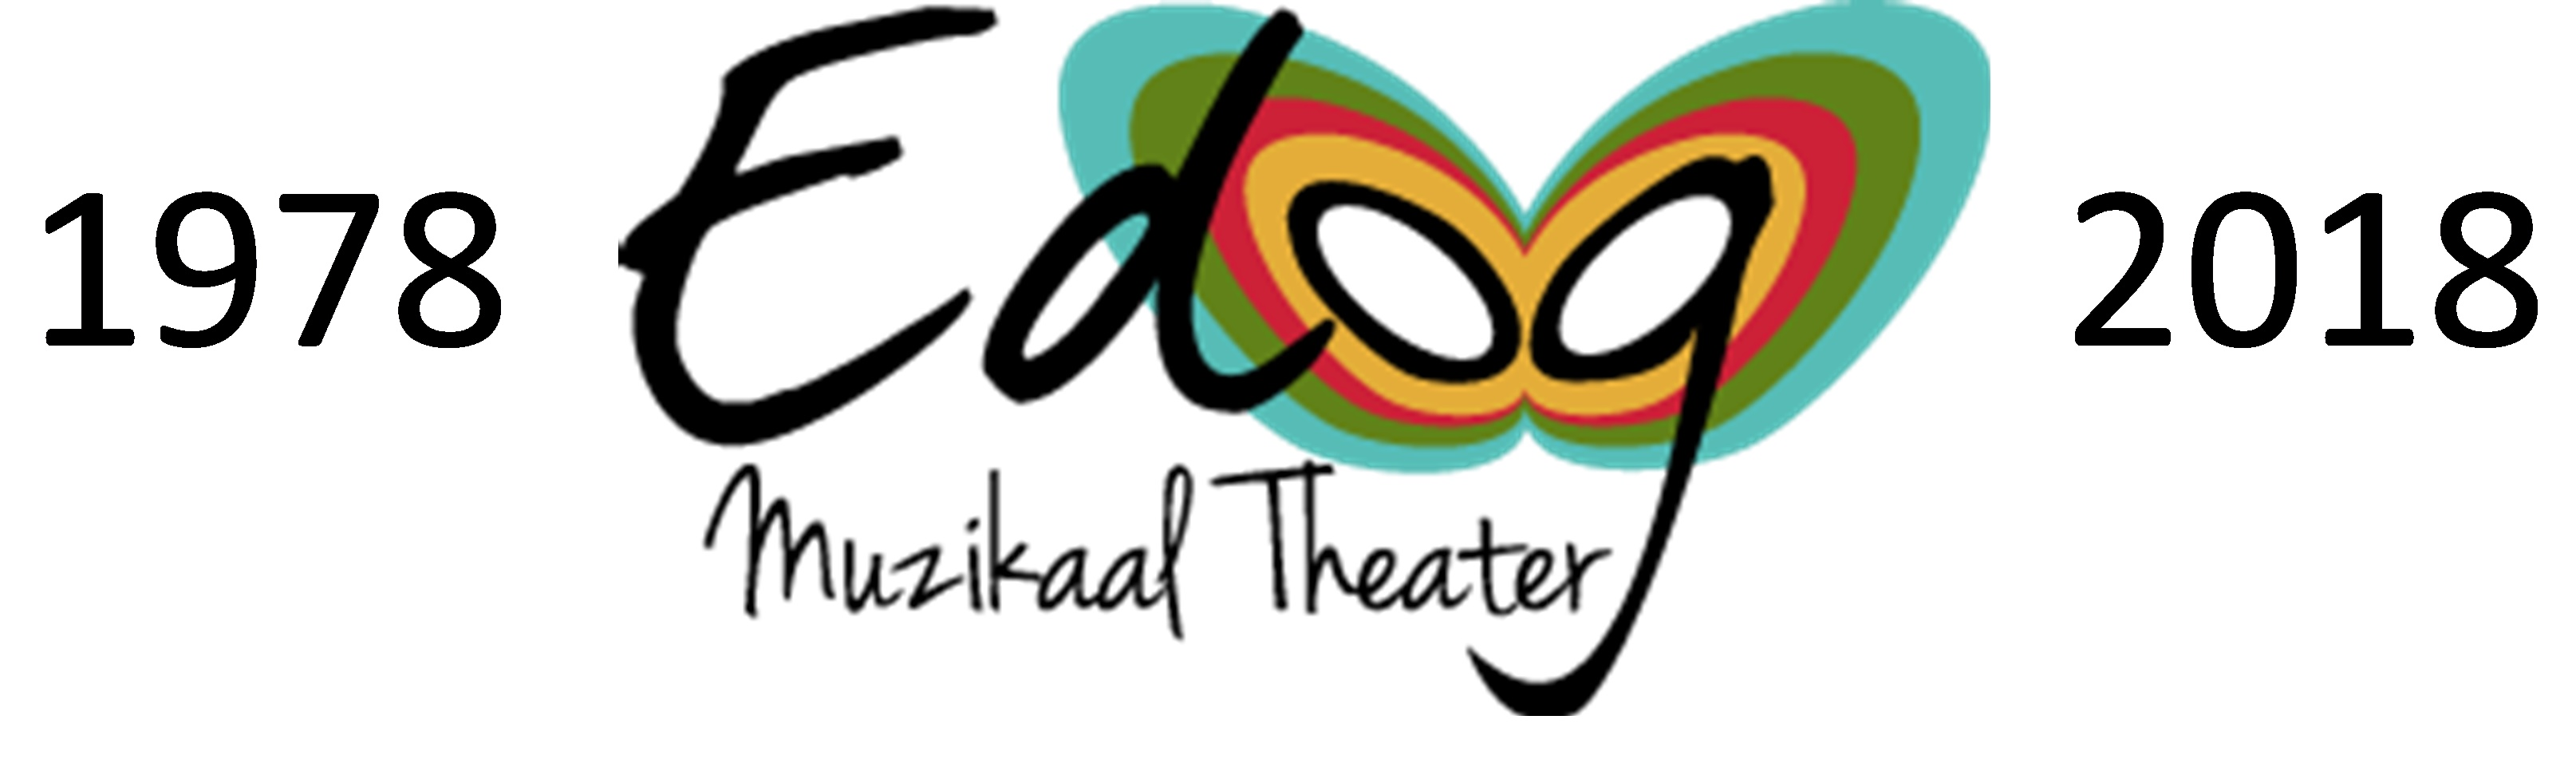 40 jaar logo